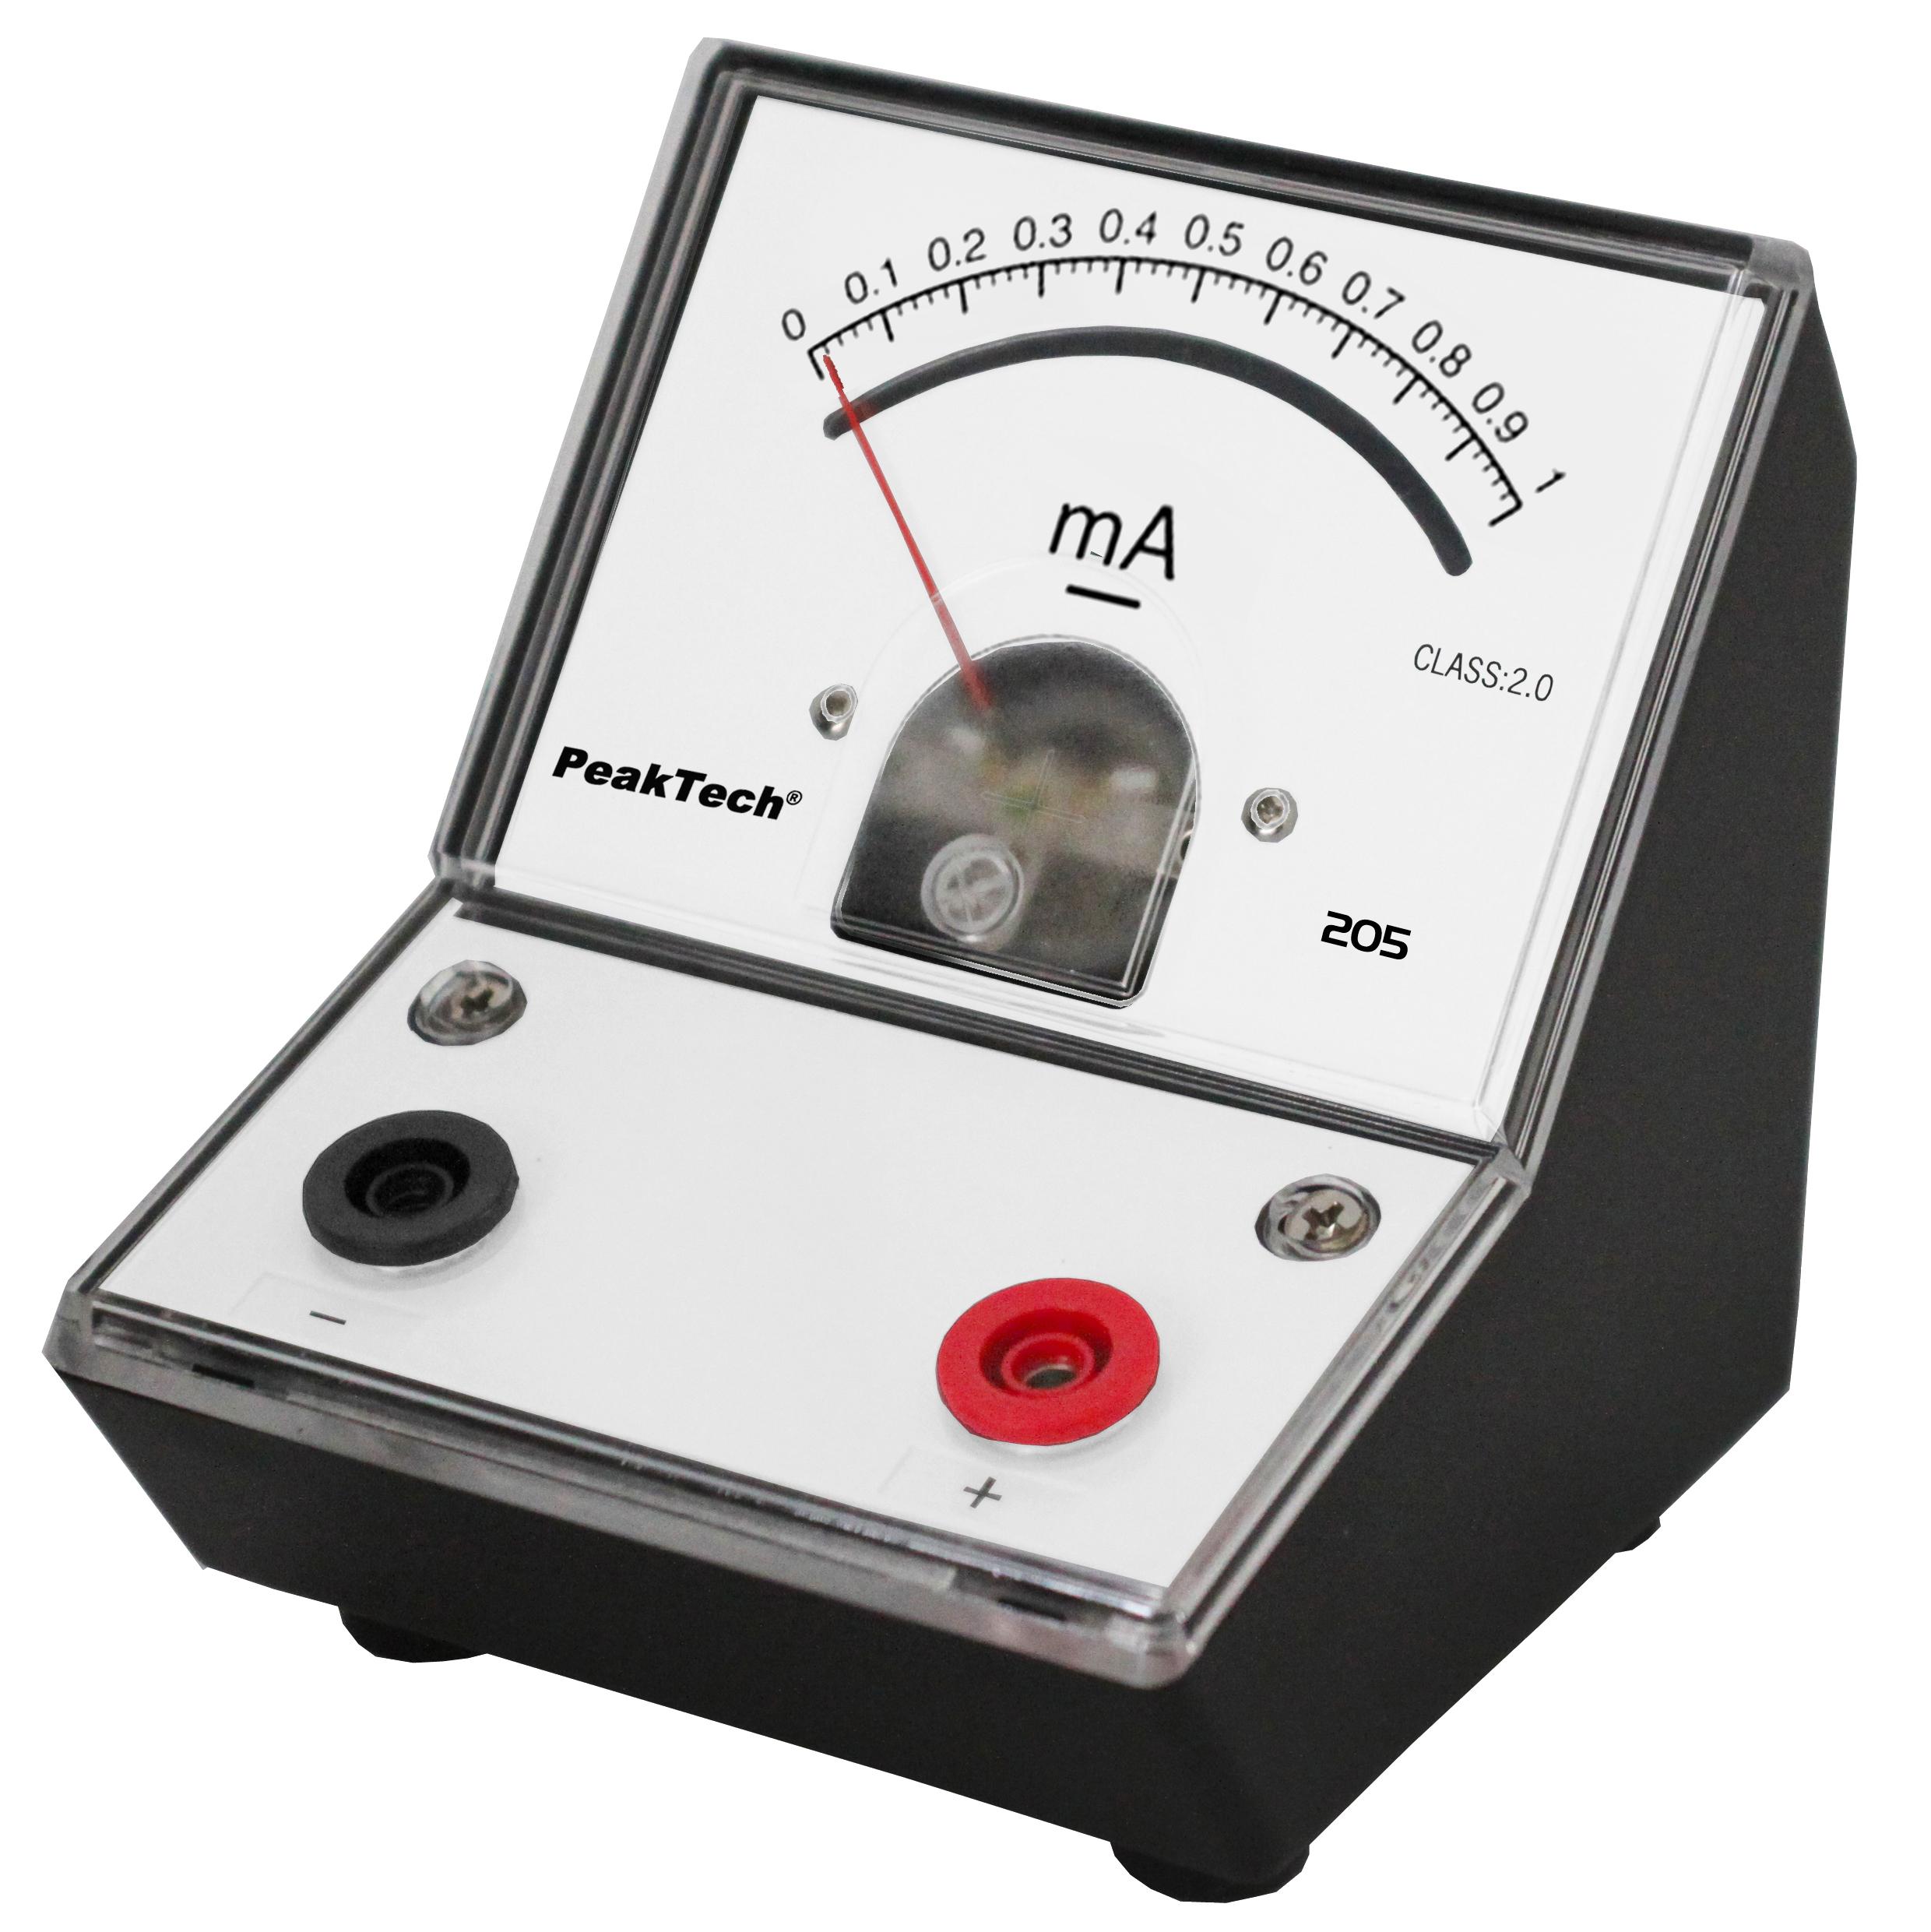 «PeakTech® P 205-03» Analog amperemeter - 0 ... 1mA DC